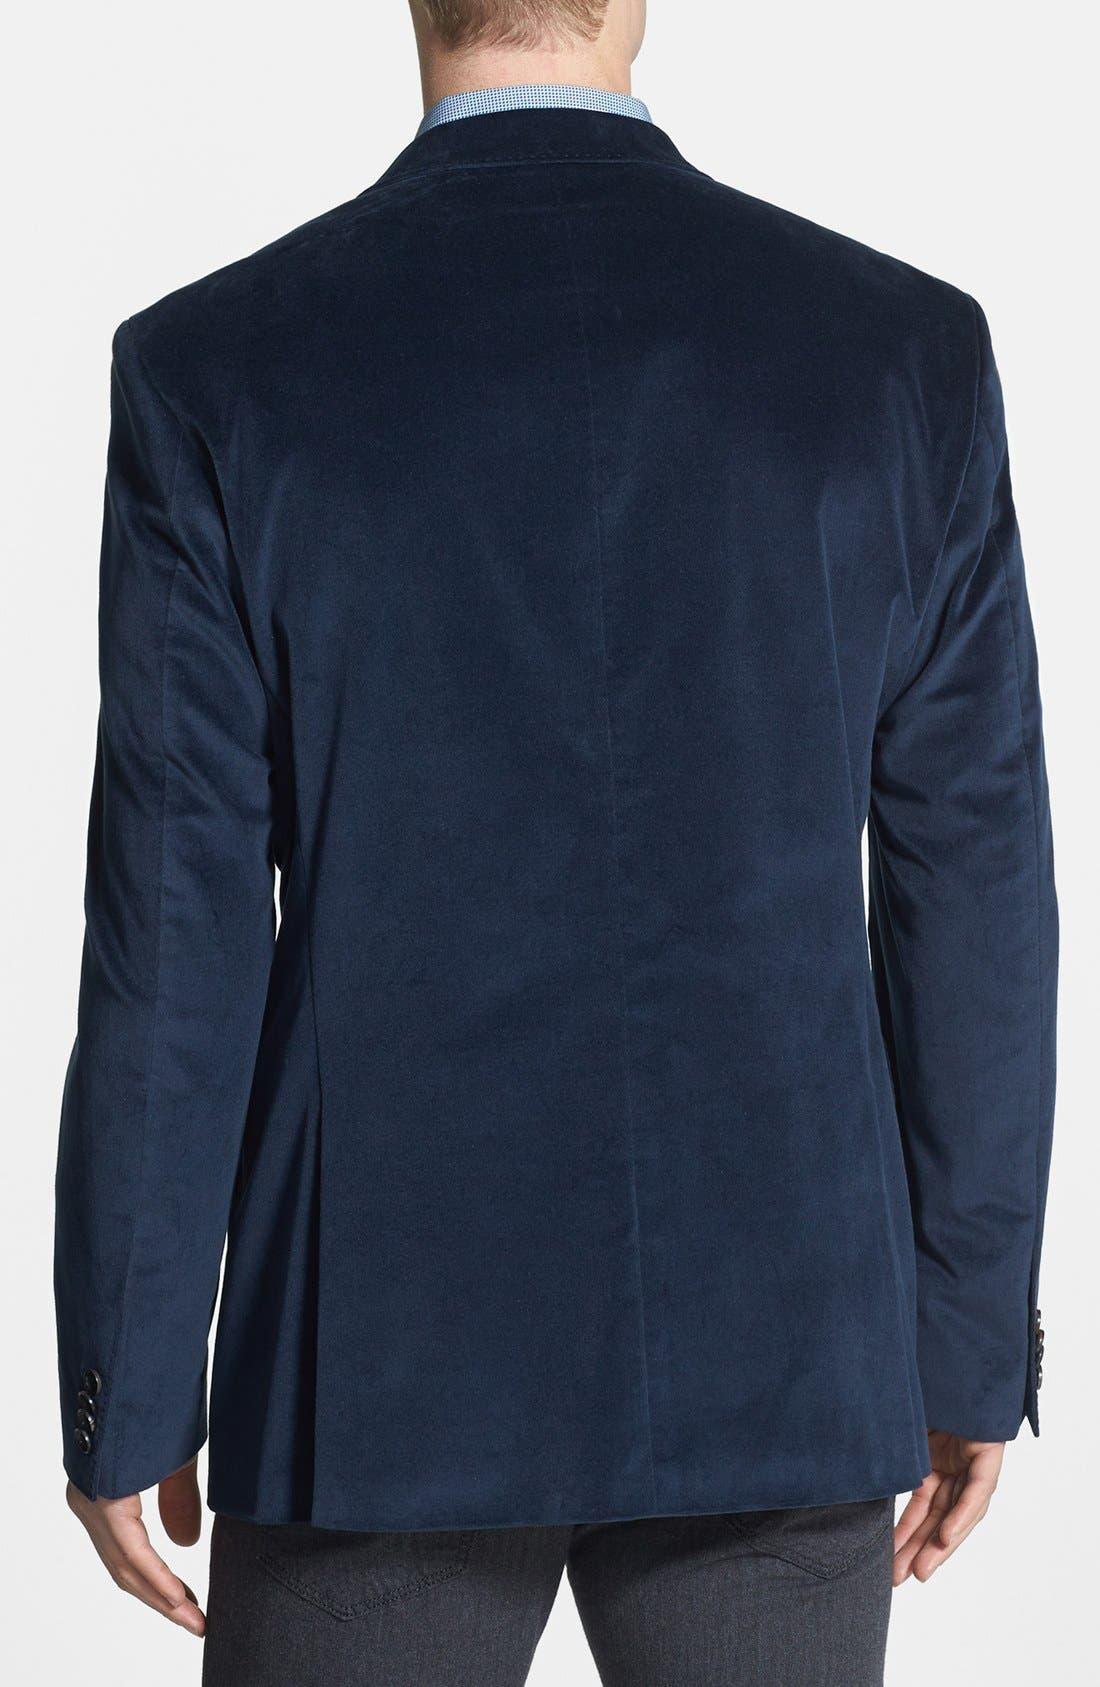 Alternate Image 2  - BOSS HUGO BOSS 'The Coast Us' Stretch Cotton Sportcoat